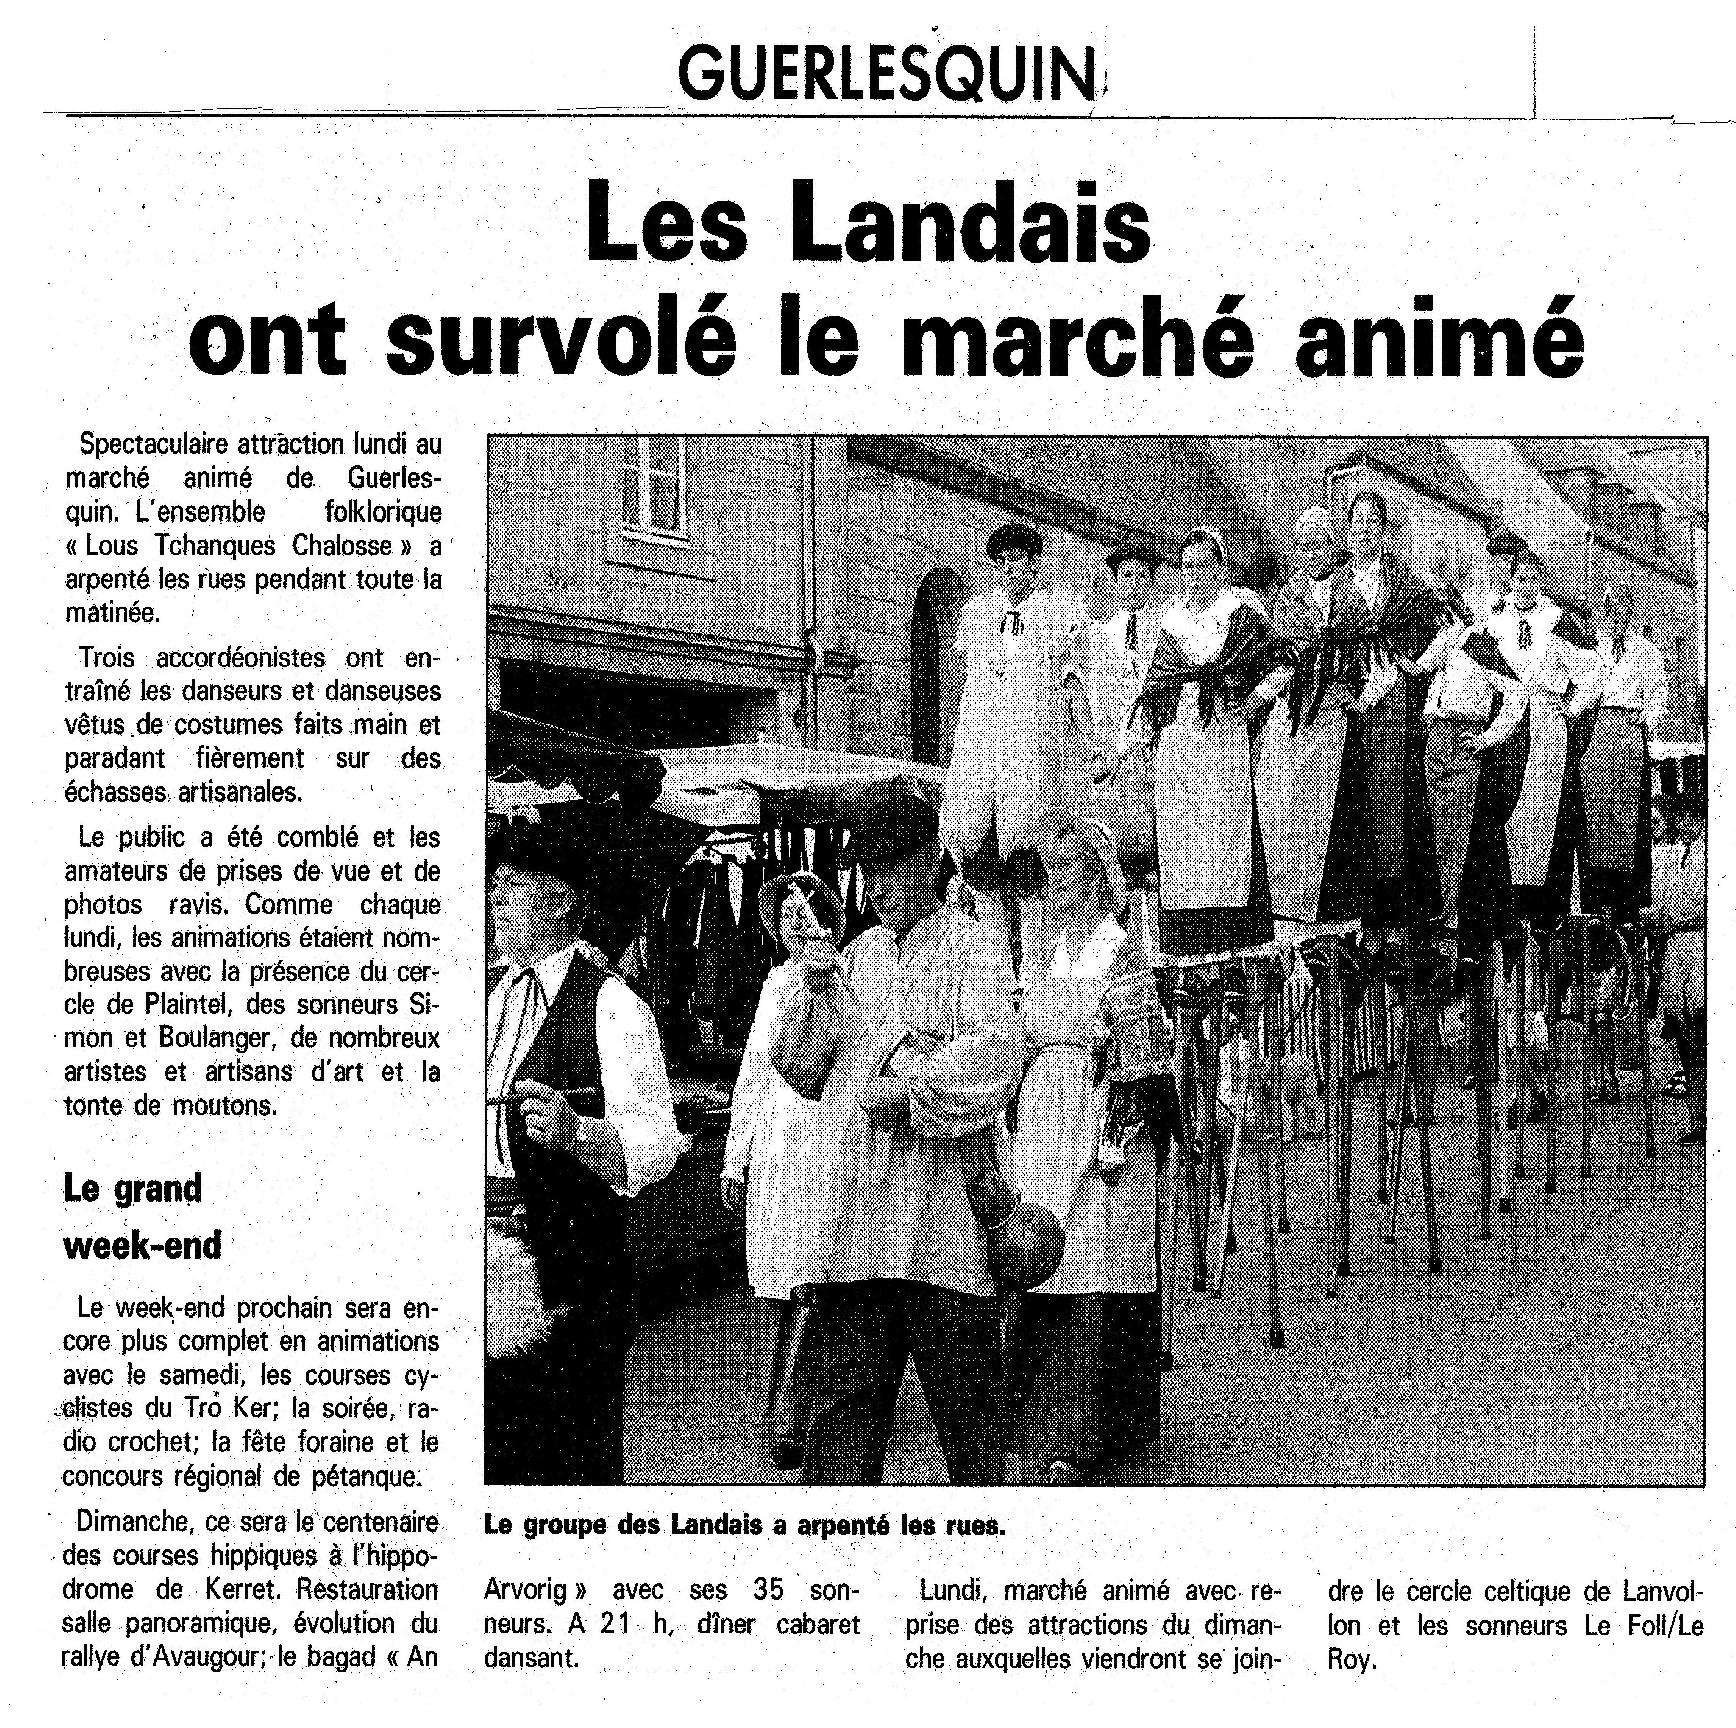 Guerlesquin 2000